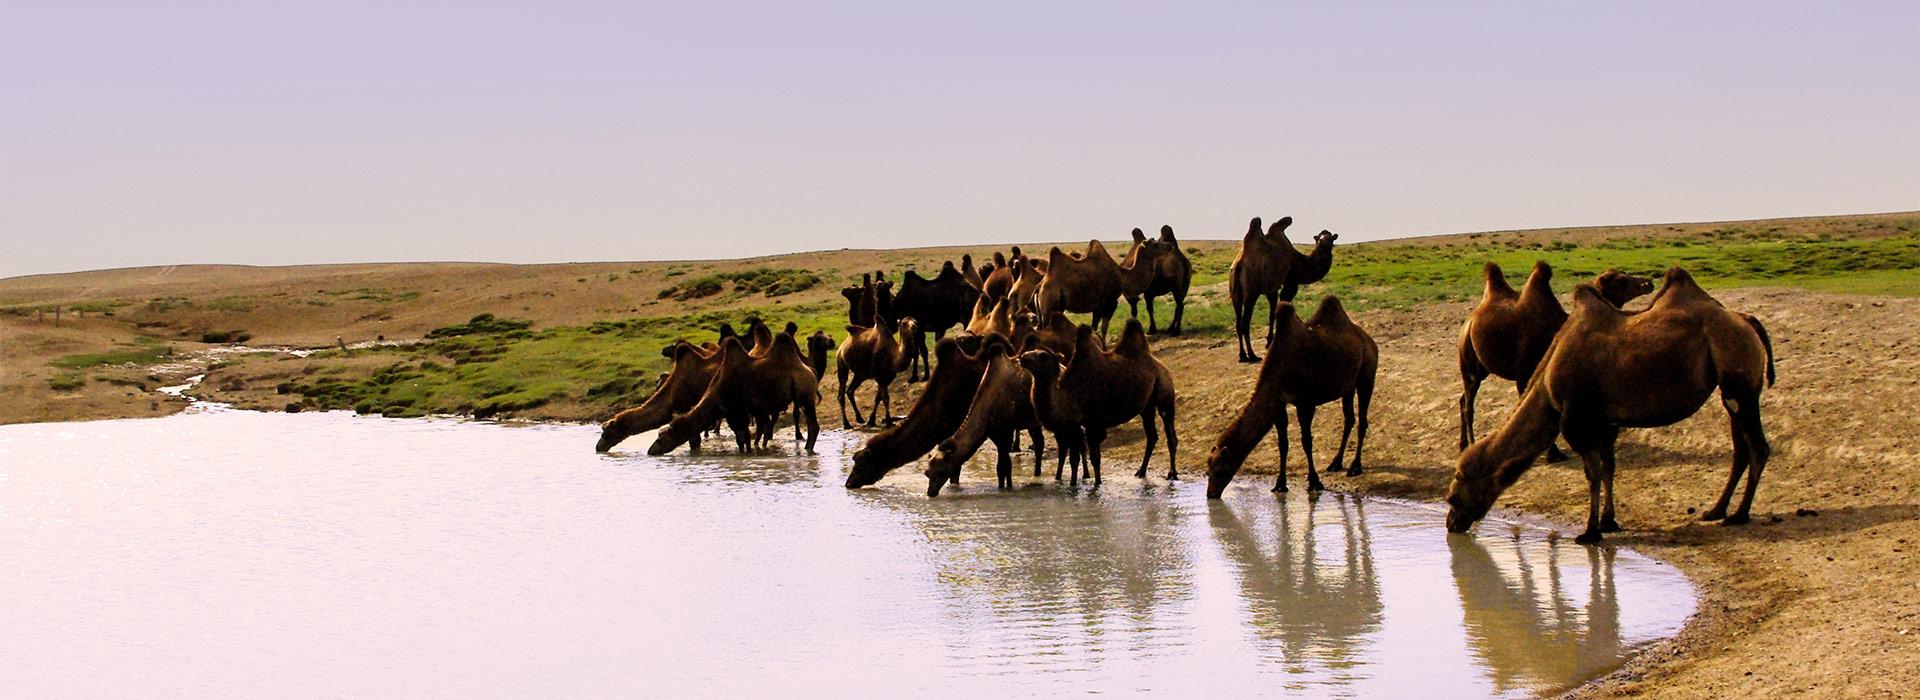 camel-drinking-water-in-south-gobi